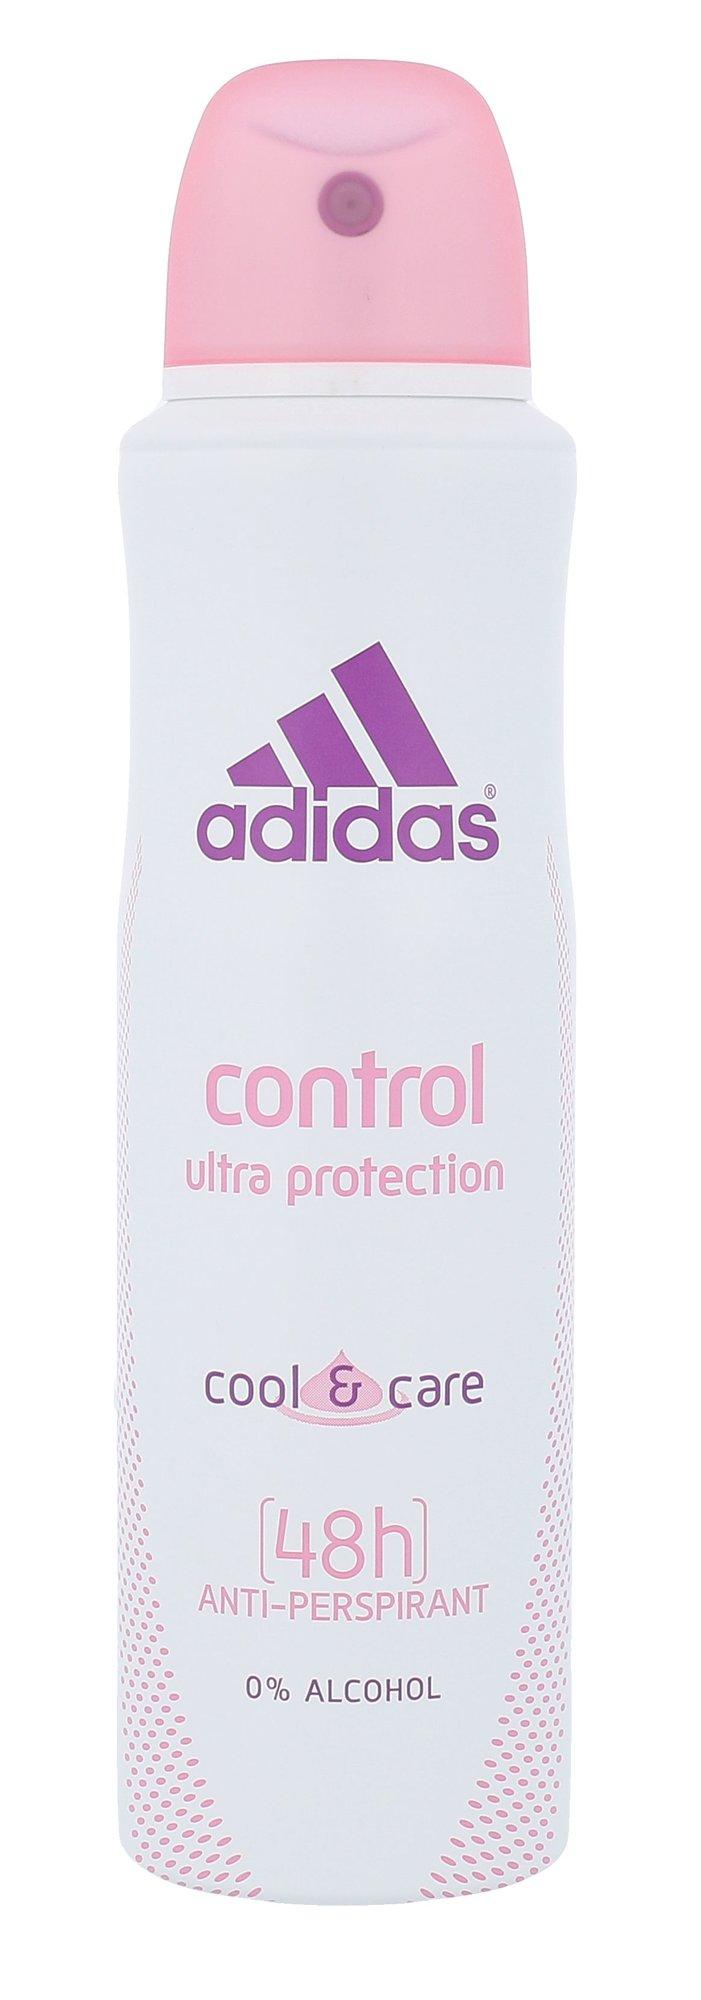 Adidas Control Antiperspirant 150ml